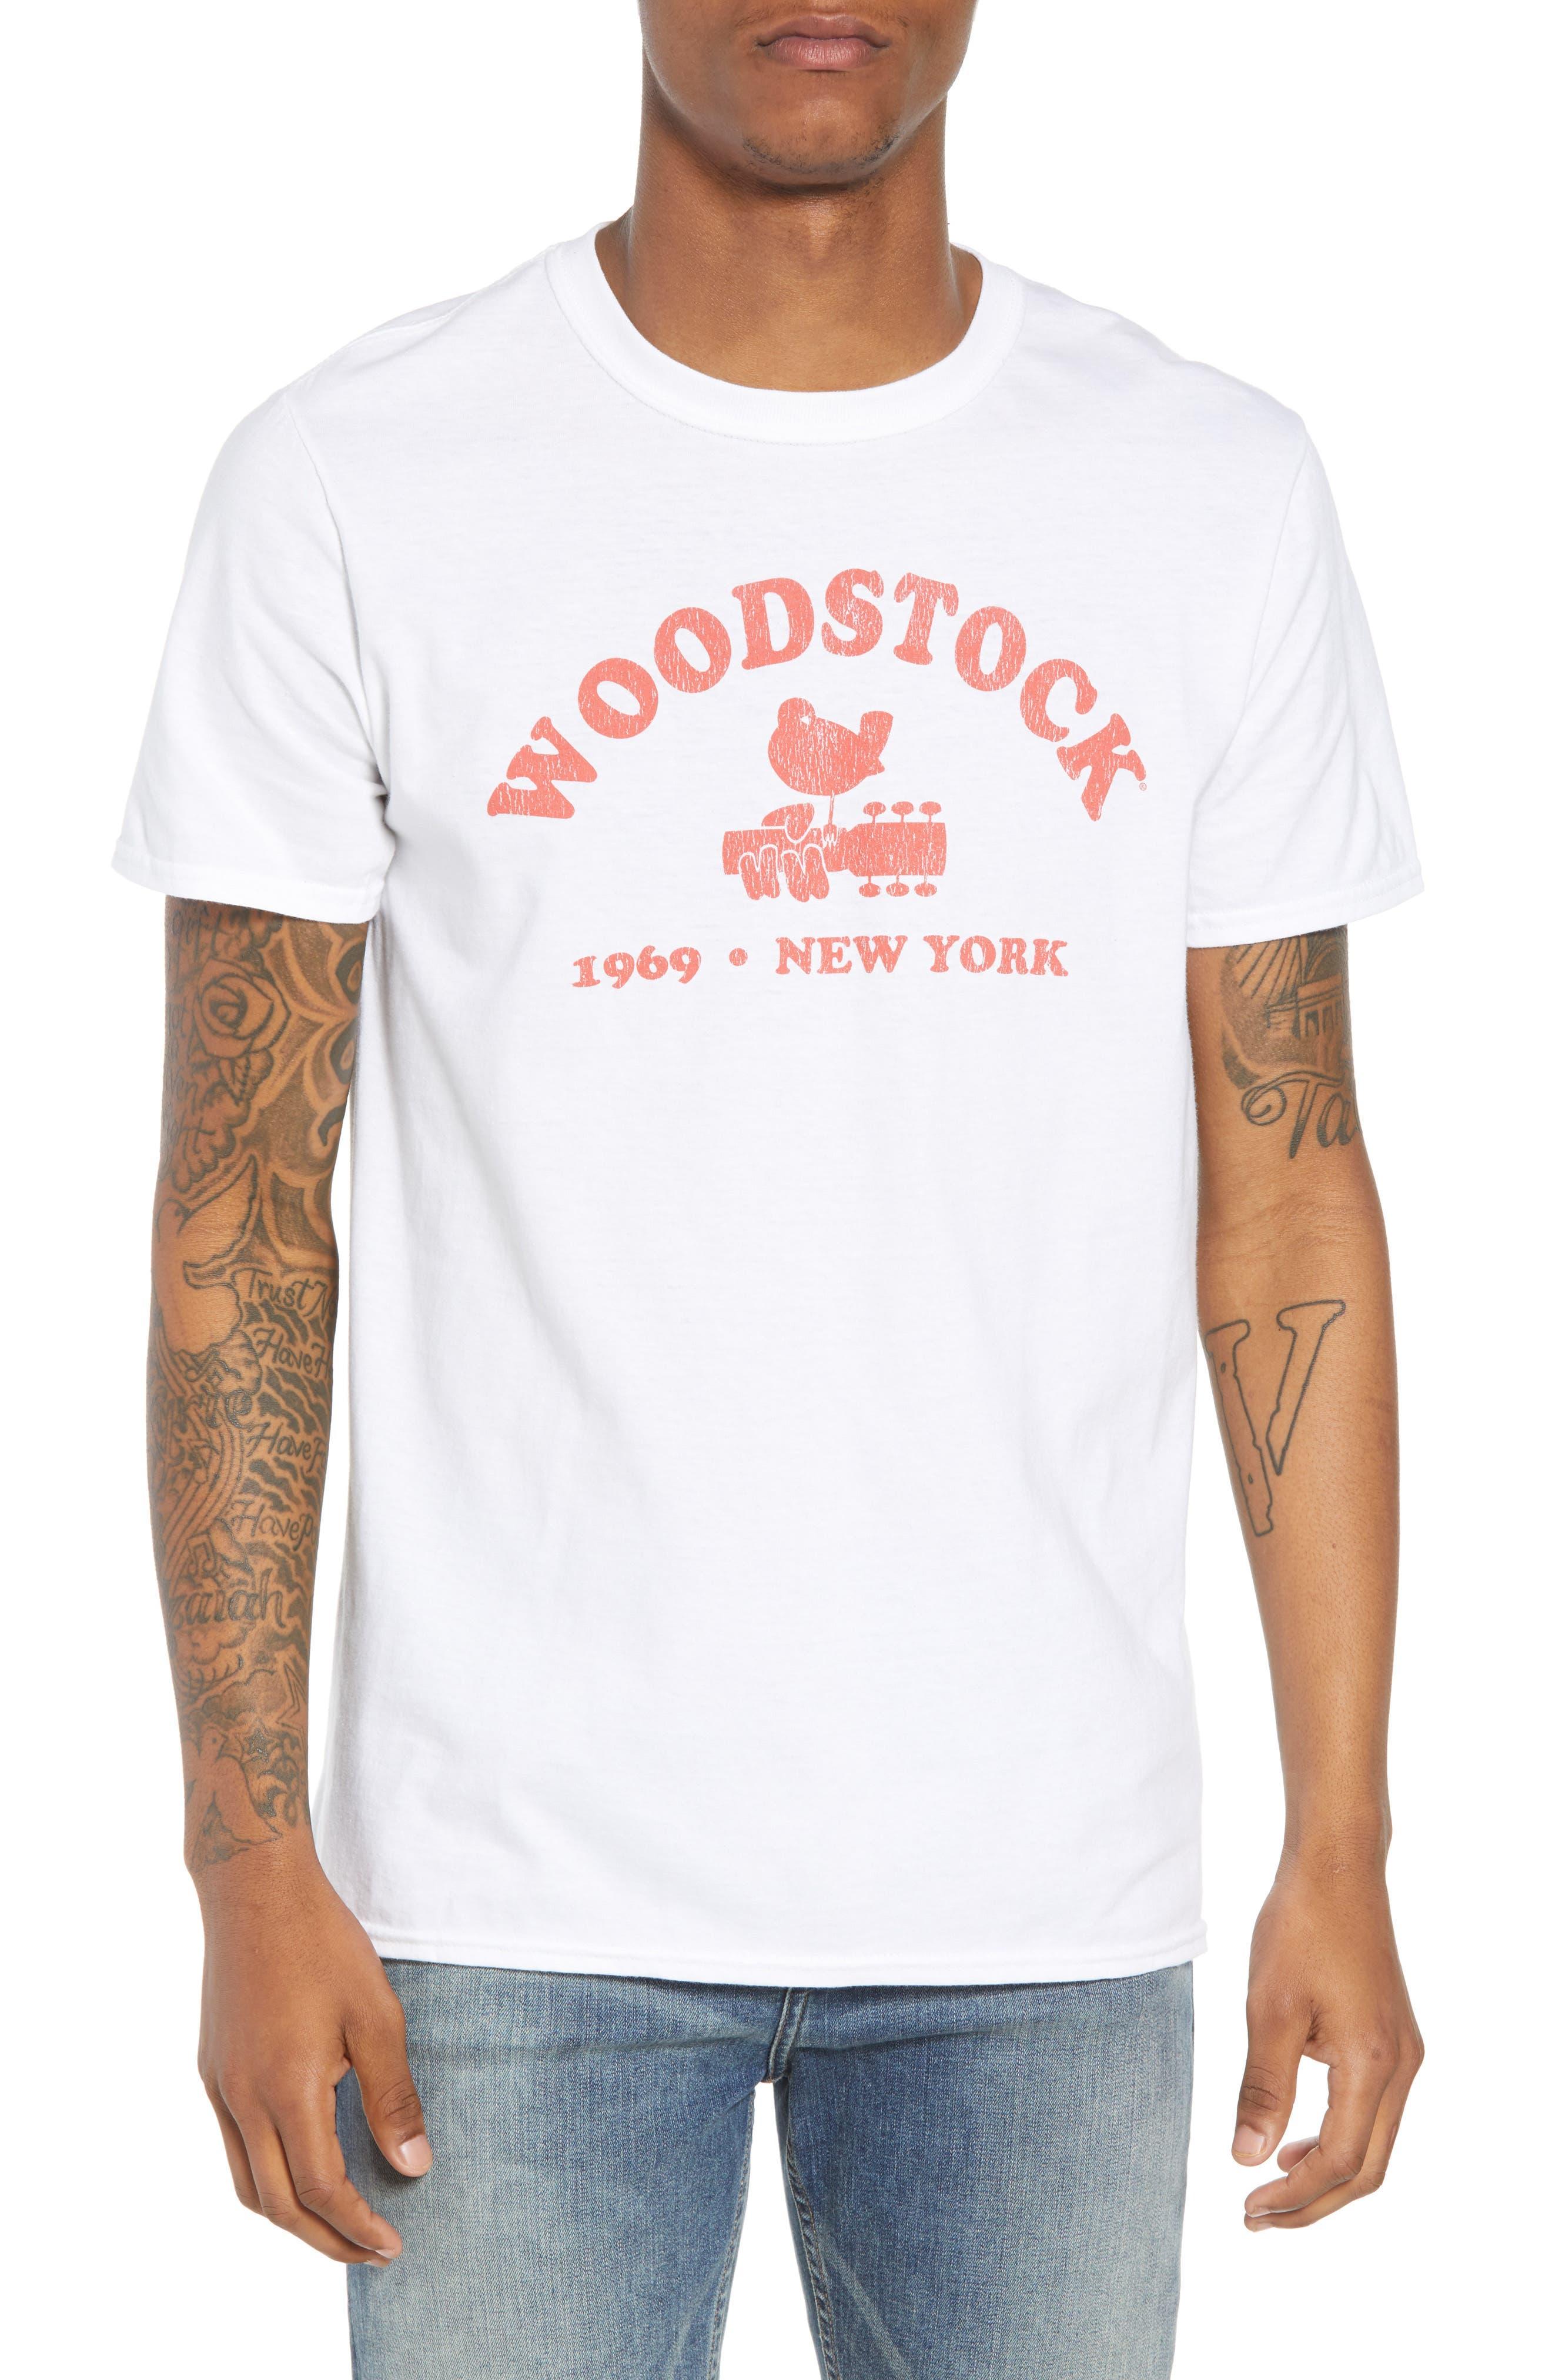 Woodstock Graphic T-Shirt,                             Main thumbnail 1, color,                             White Tee Woodstock